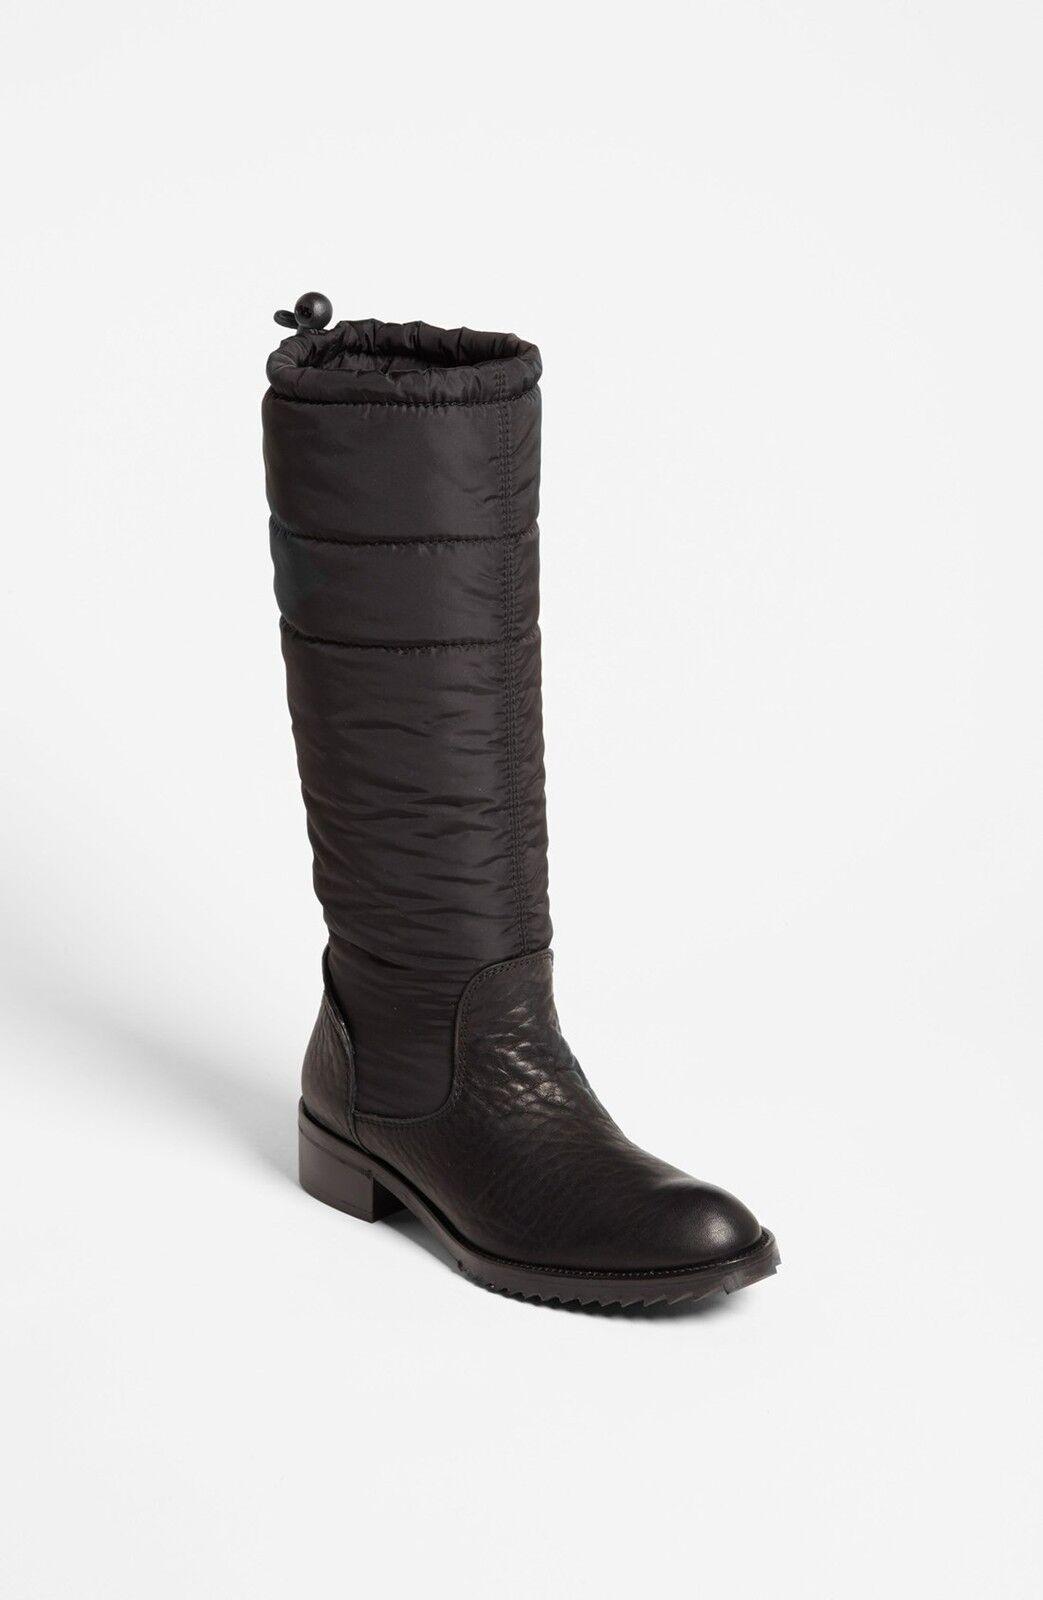 $675 Pedro Blck Garcia Ocean Blck Pedro Deer Leather Riding Boot Flat Puffer Bootie 40.5-10 acbe78